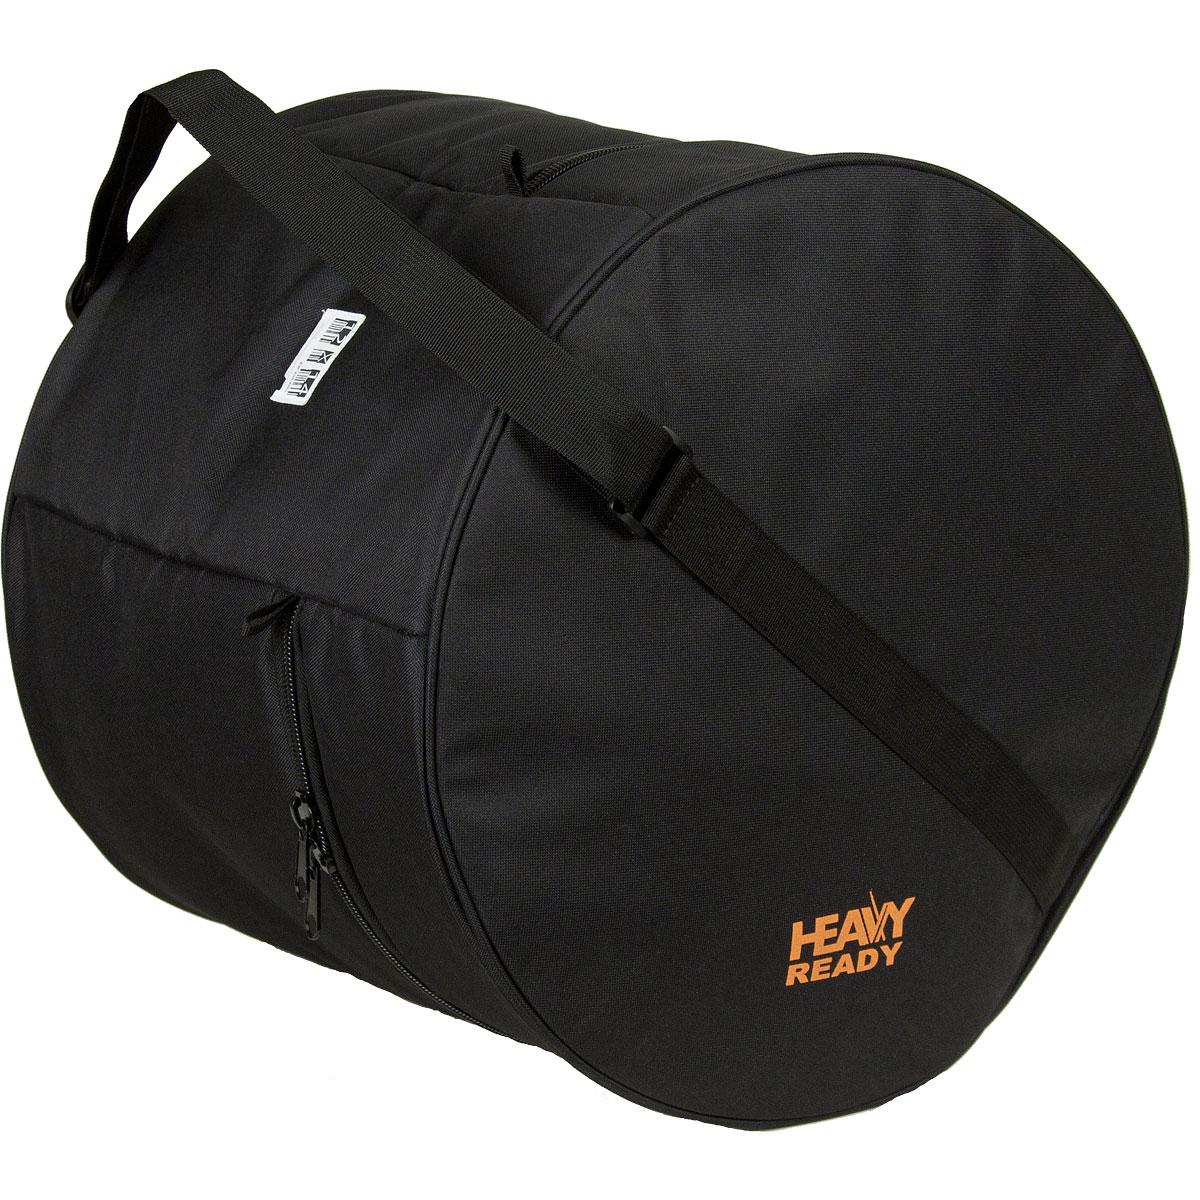 "HR1214 ProTec ""Heavy Ready"" Tom Bag 12""x14"" - Zwart"